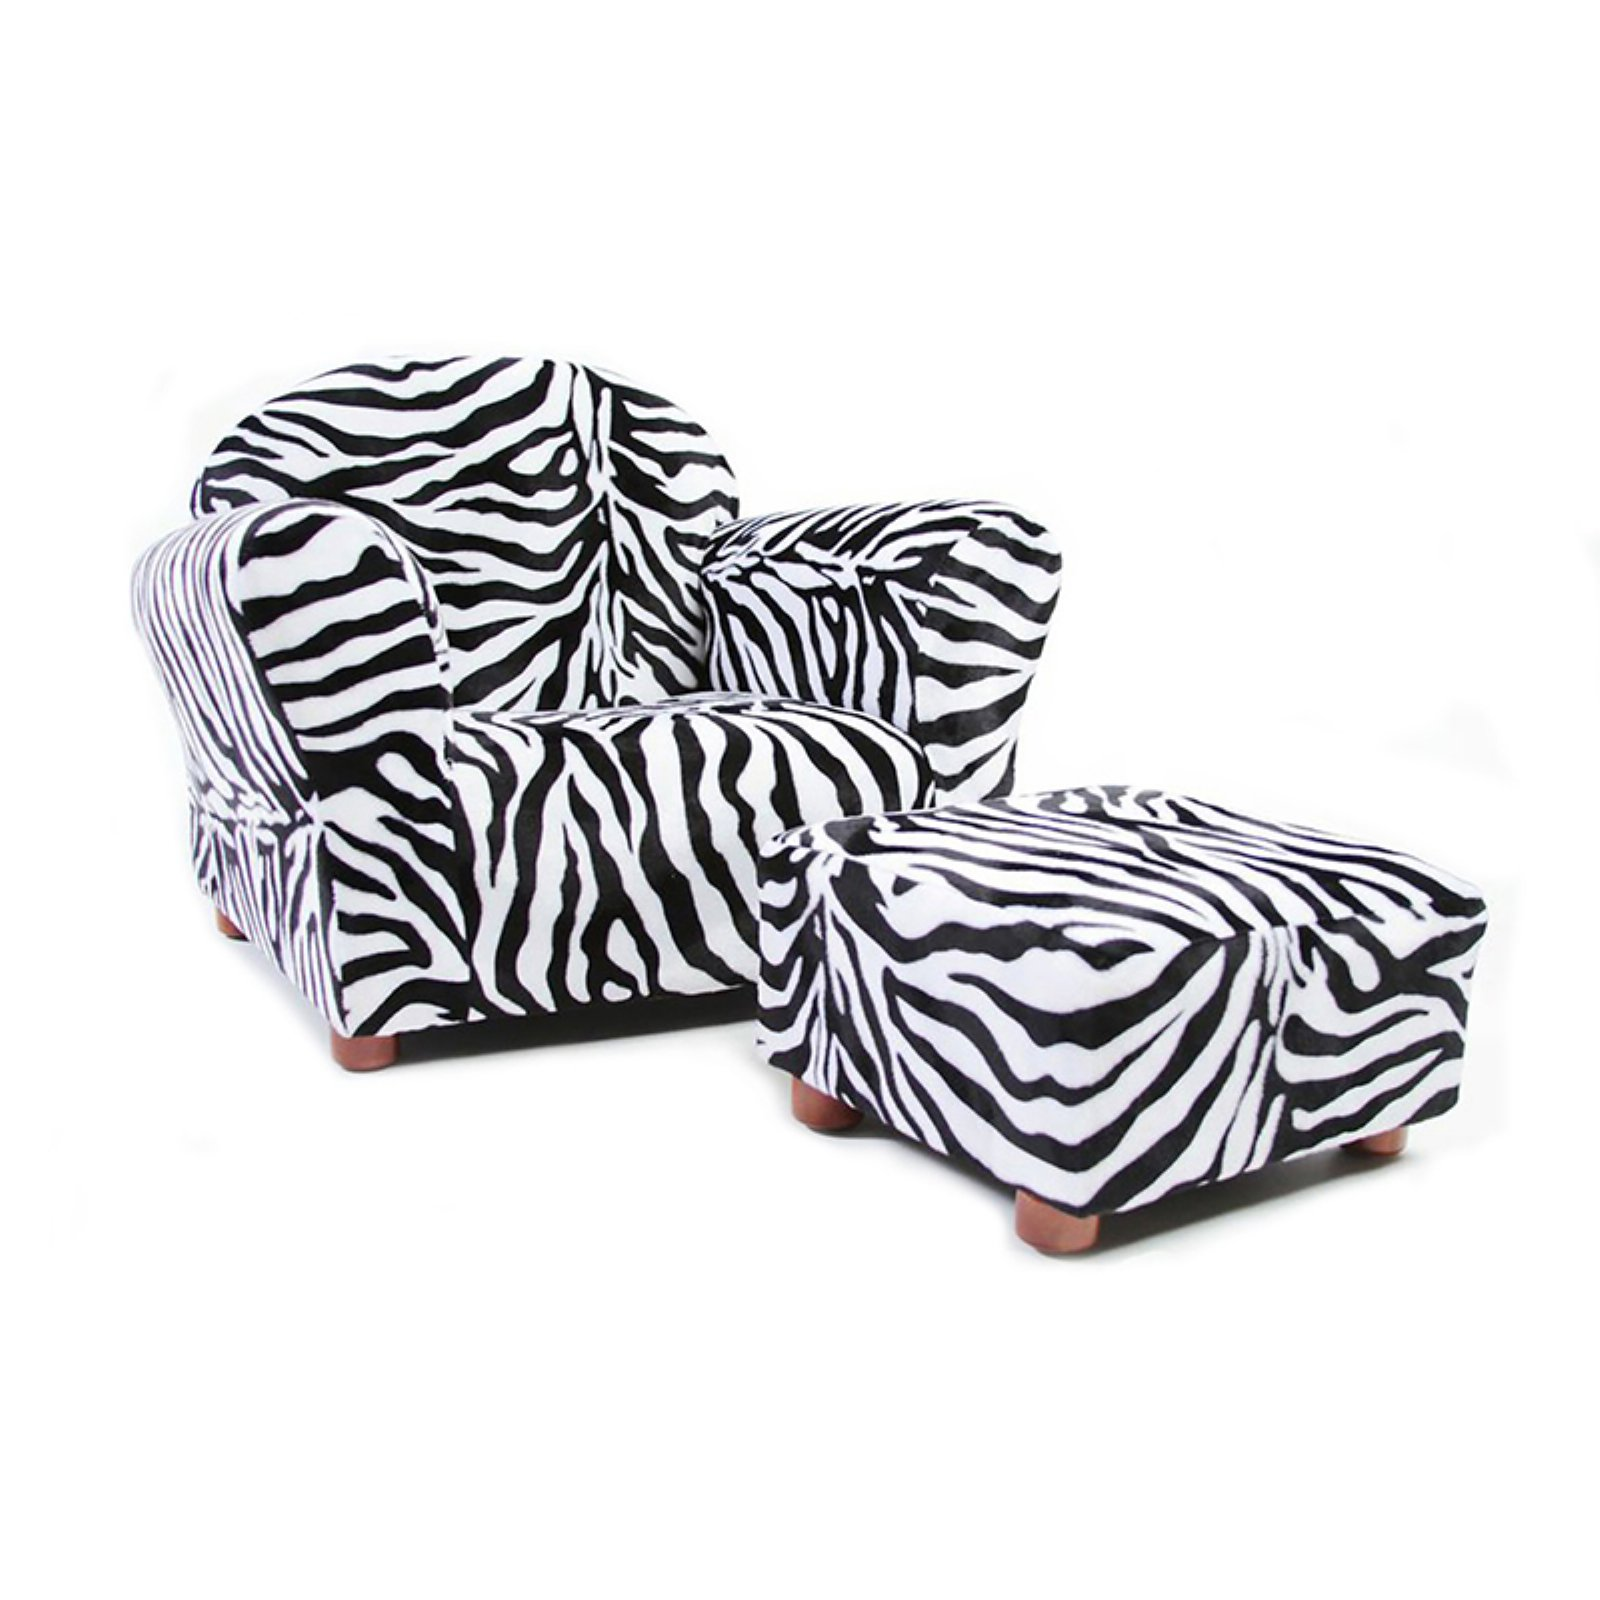 KEET Roundy Kids Chair Zebra with Ottoman